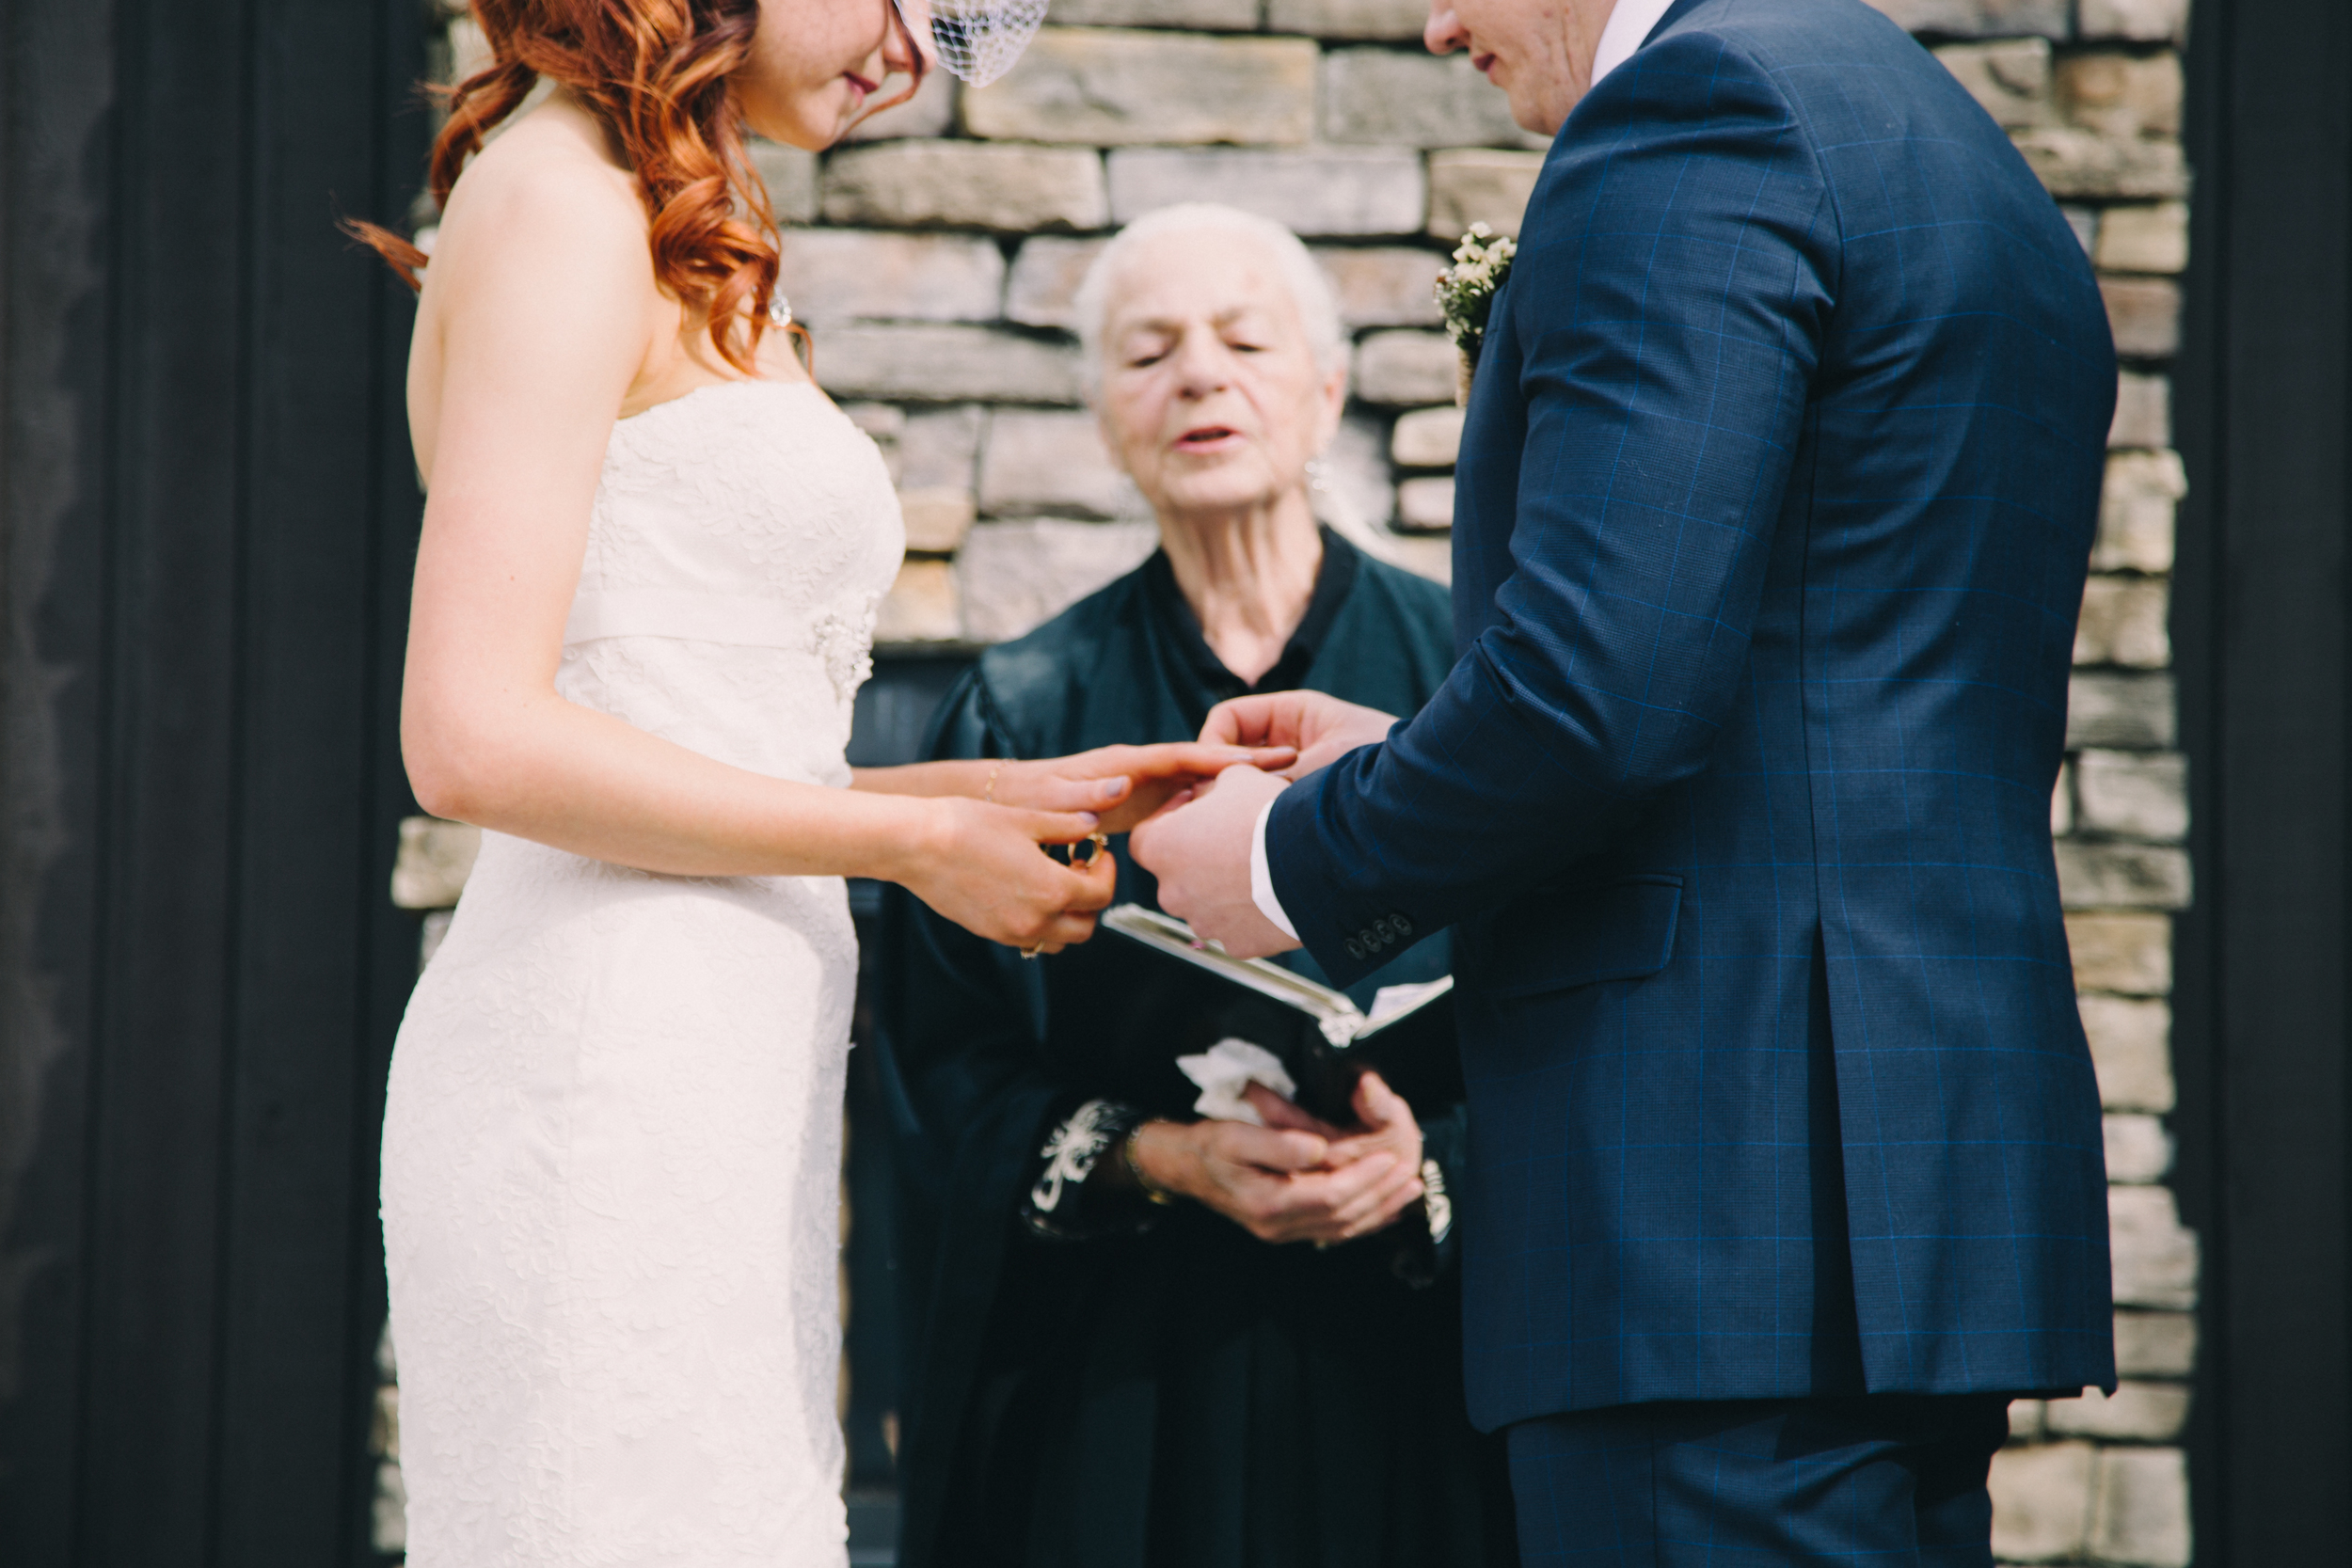 SharaiSiemens_Photography_Wedding_AndrewSarah24.jpg